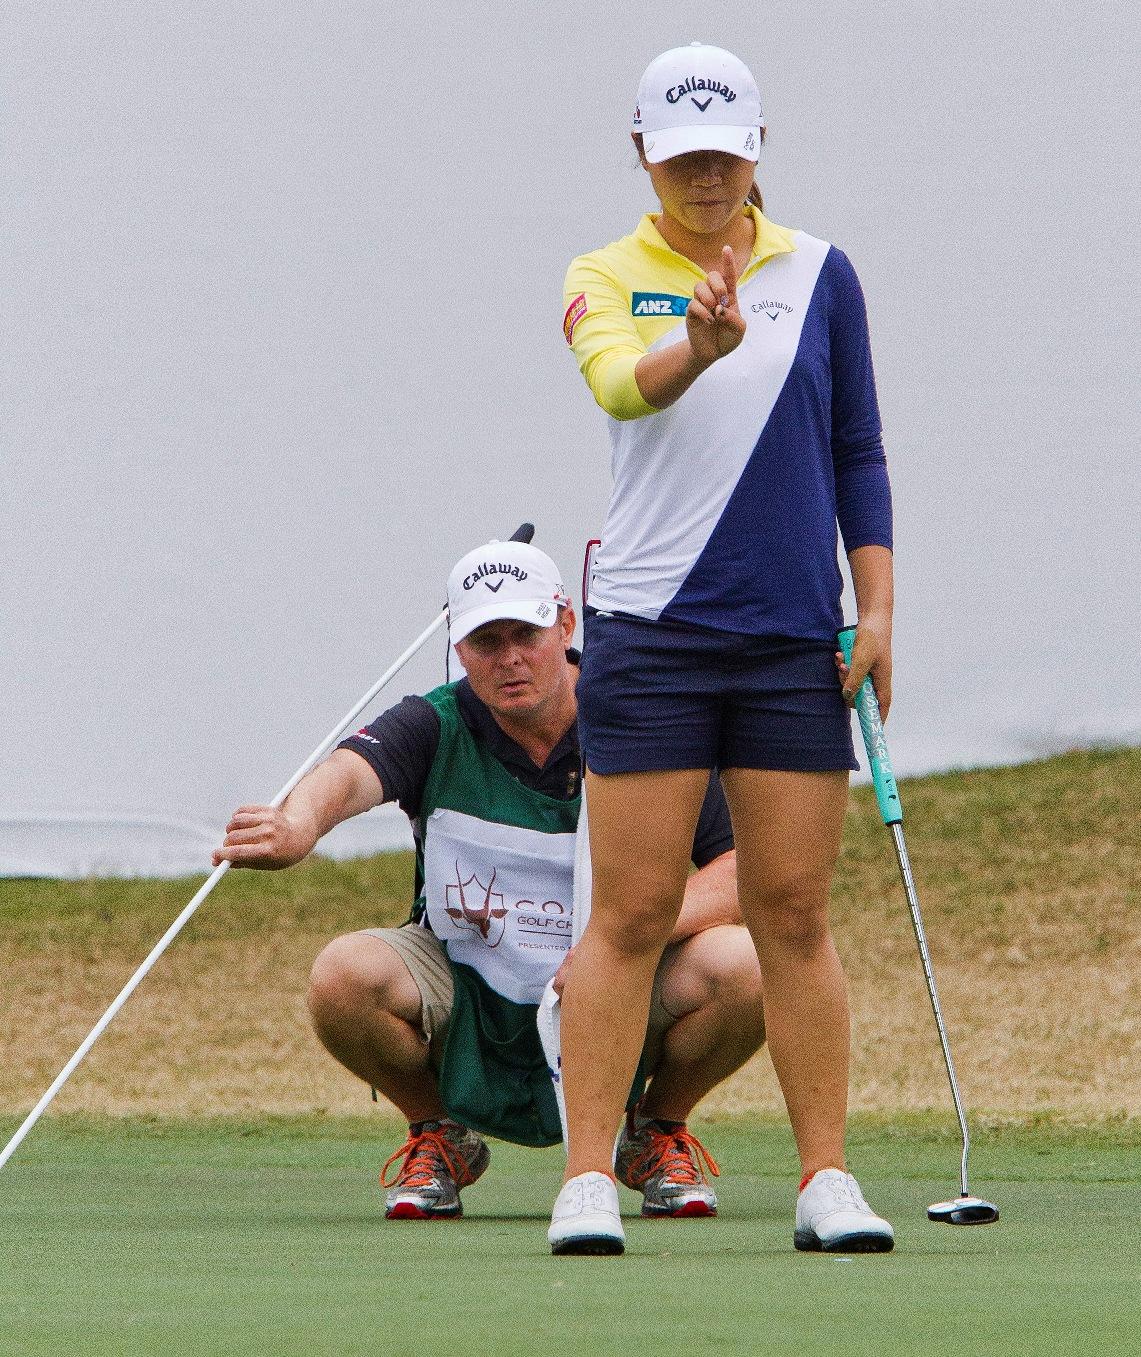 Ko, Jang share lead after a long day on LPGA Tour